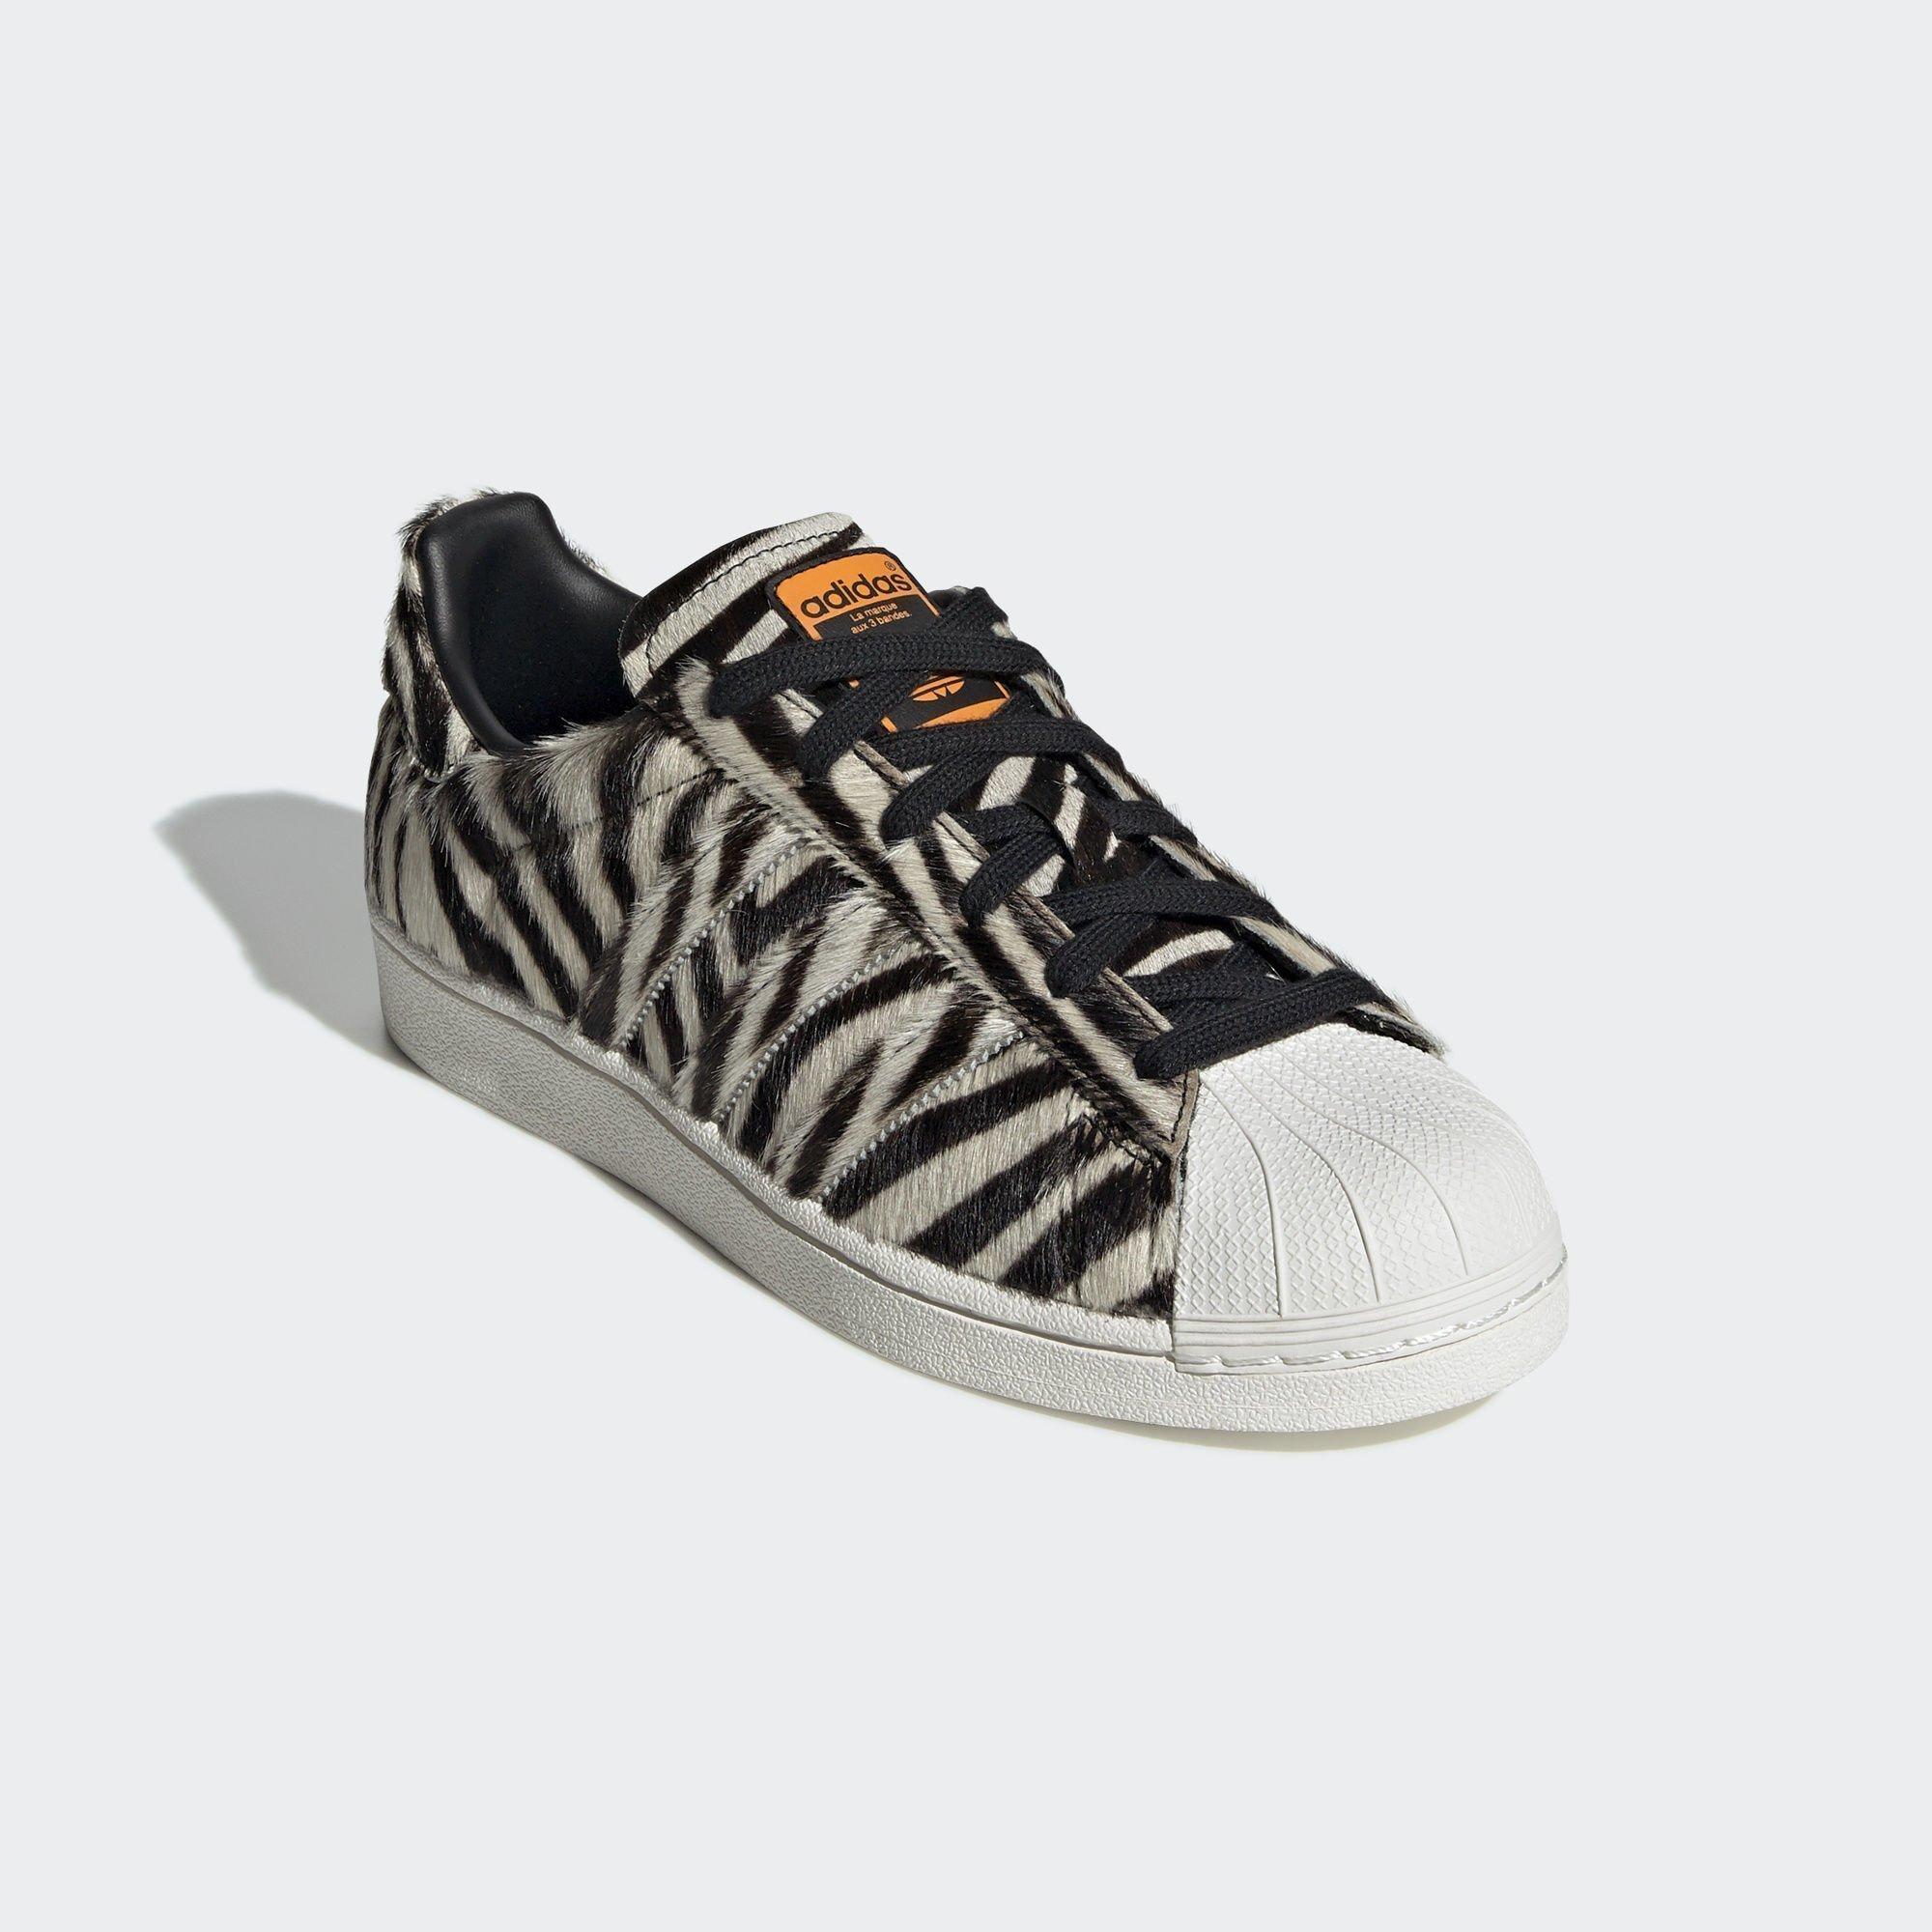 Adidas Superstar CG5988